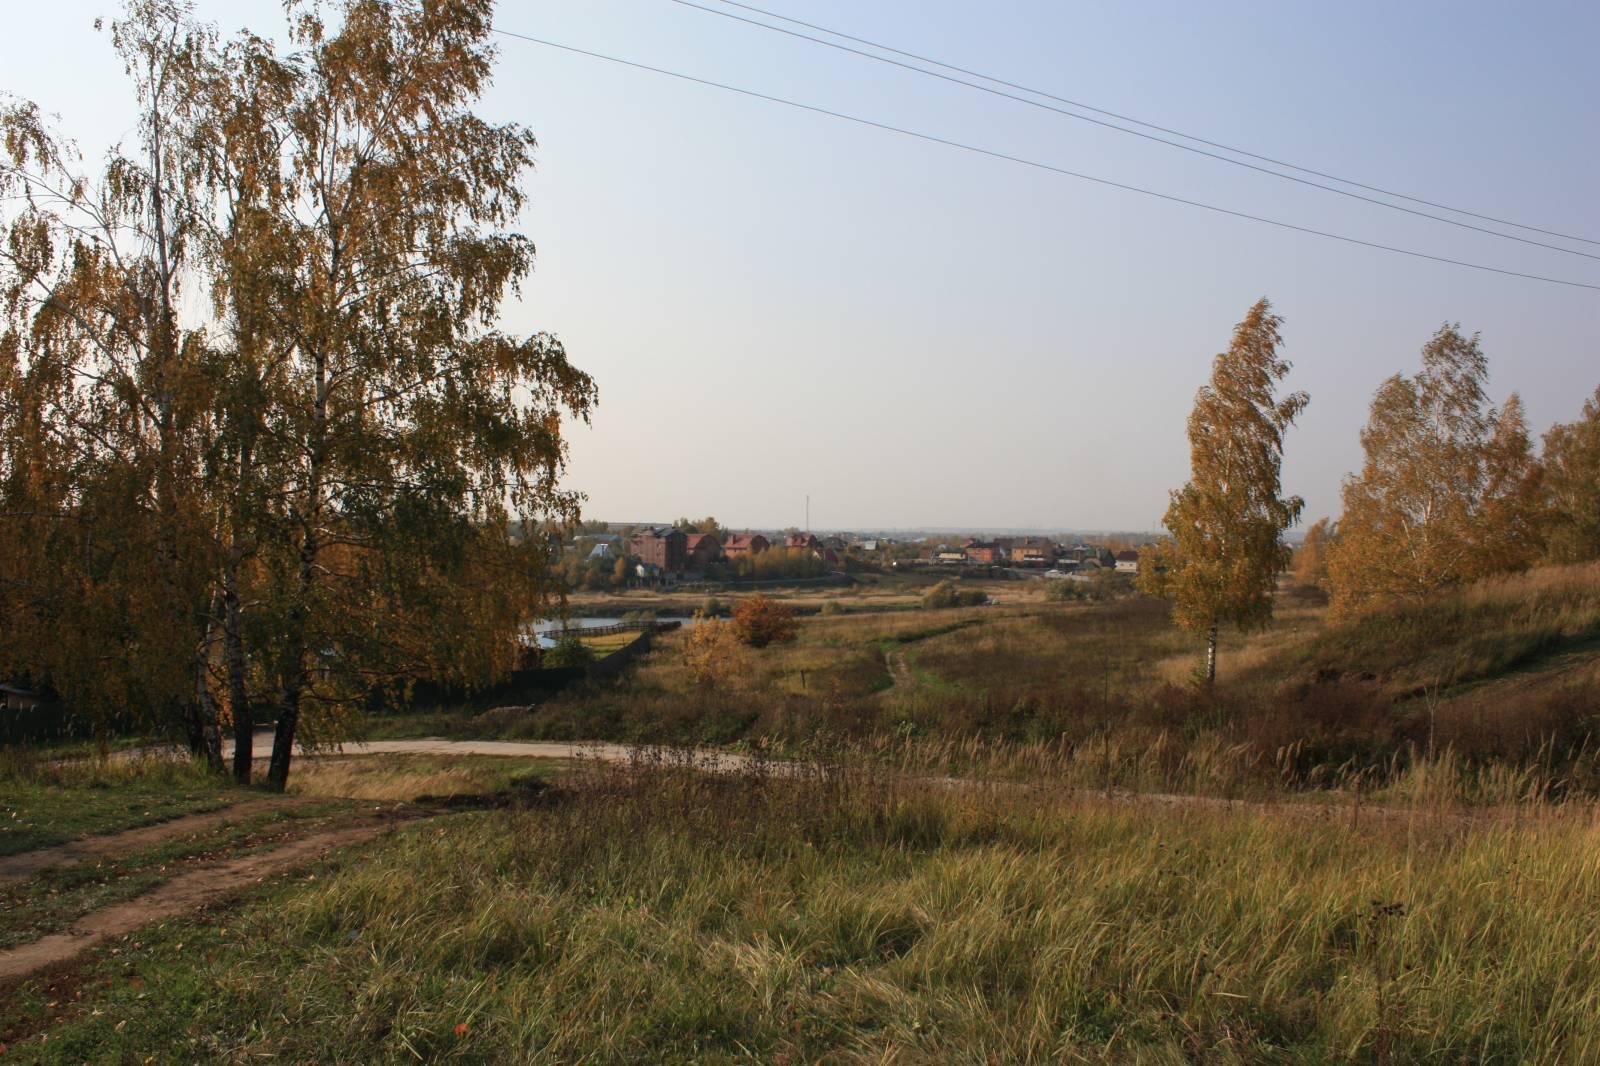 Прокат квадроциклов в Челябинске